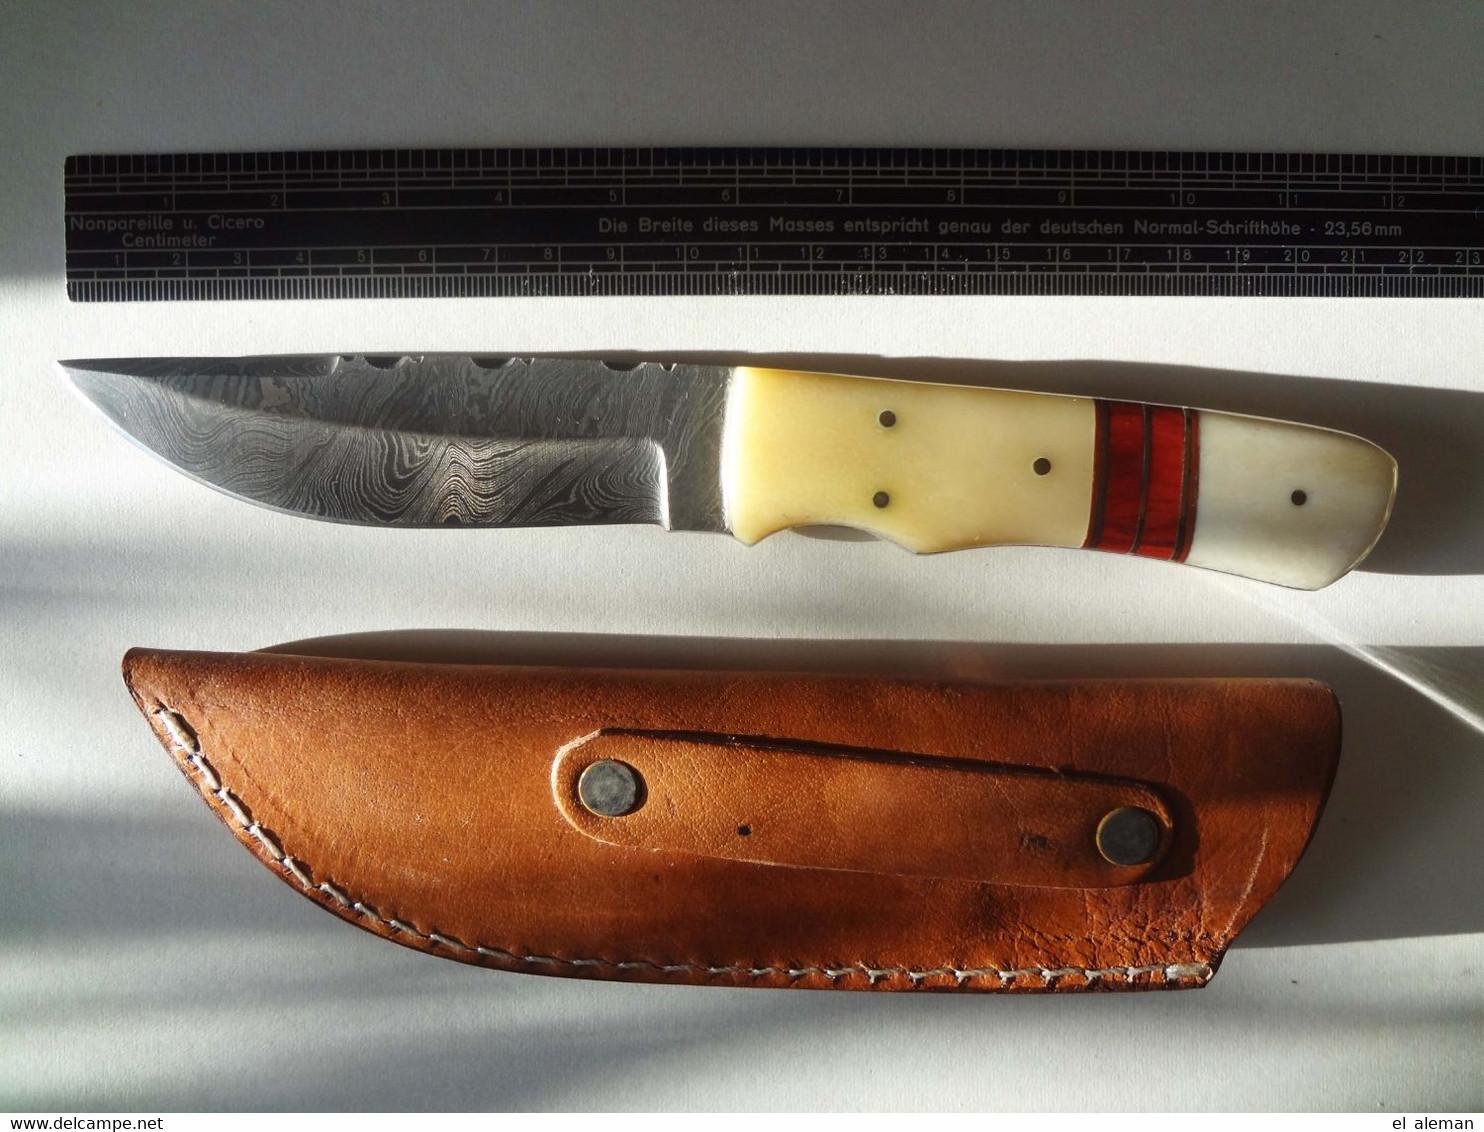 Messer, Damastmesser, Bowiemesser, Jagdmesser,neu. Real Damask Knife,bowie Knife,hunting Knife,new - Messer